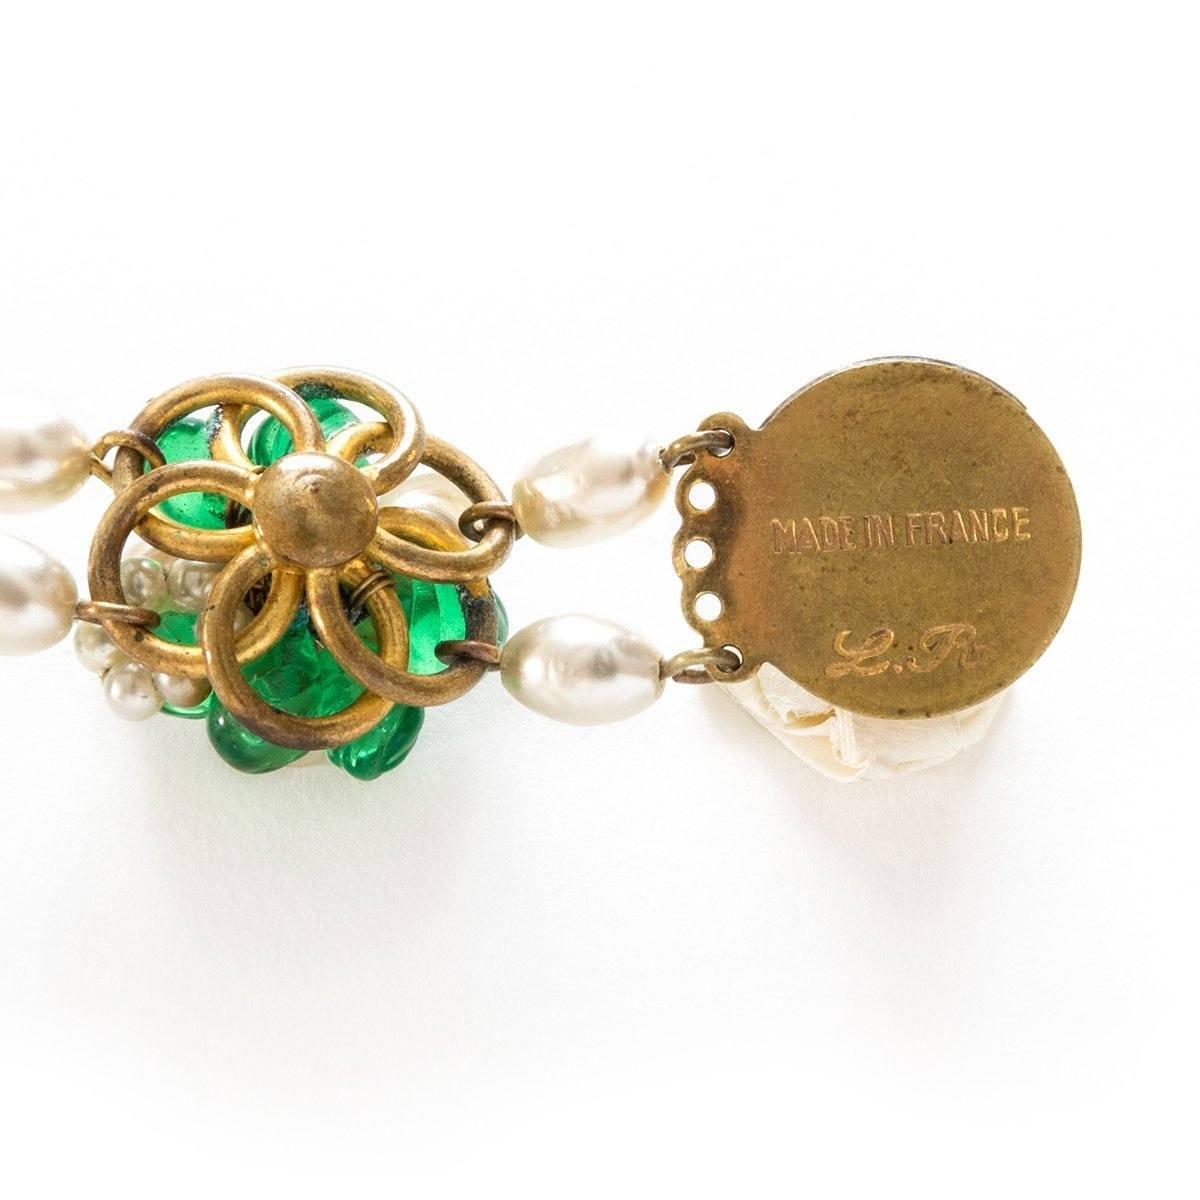 1950s Signed Louis Rousselet Freshwater Pearls & Green Glass Bracelet